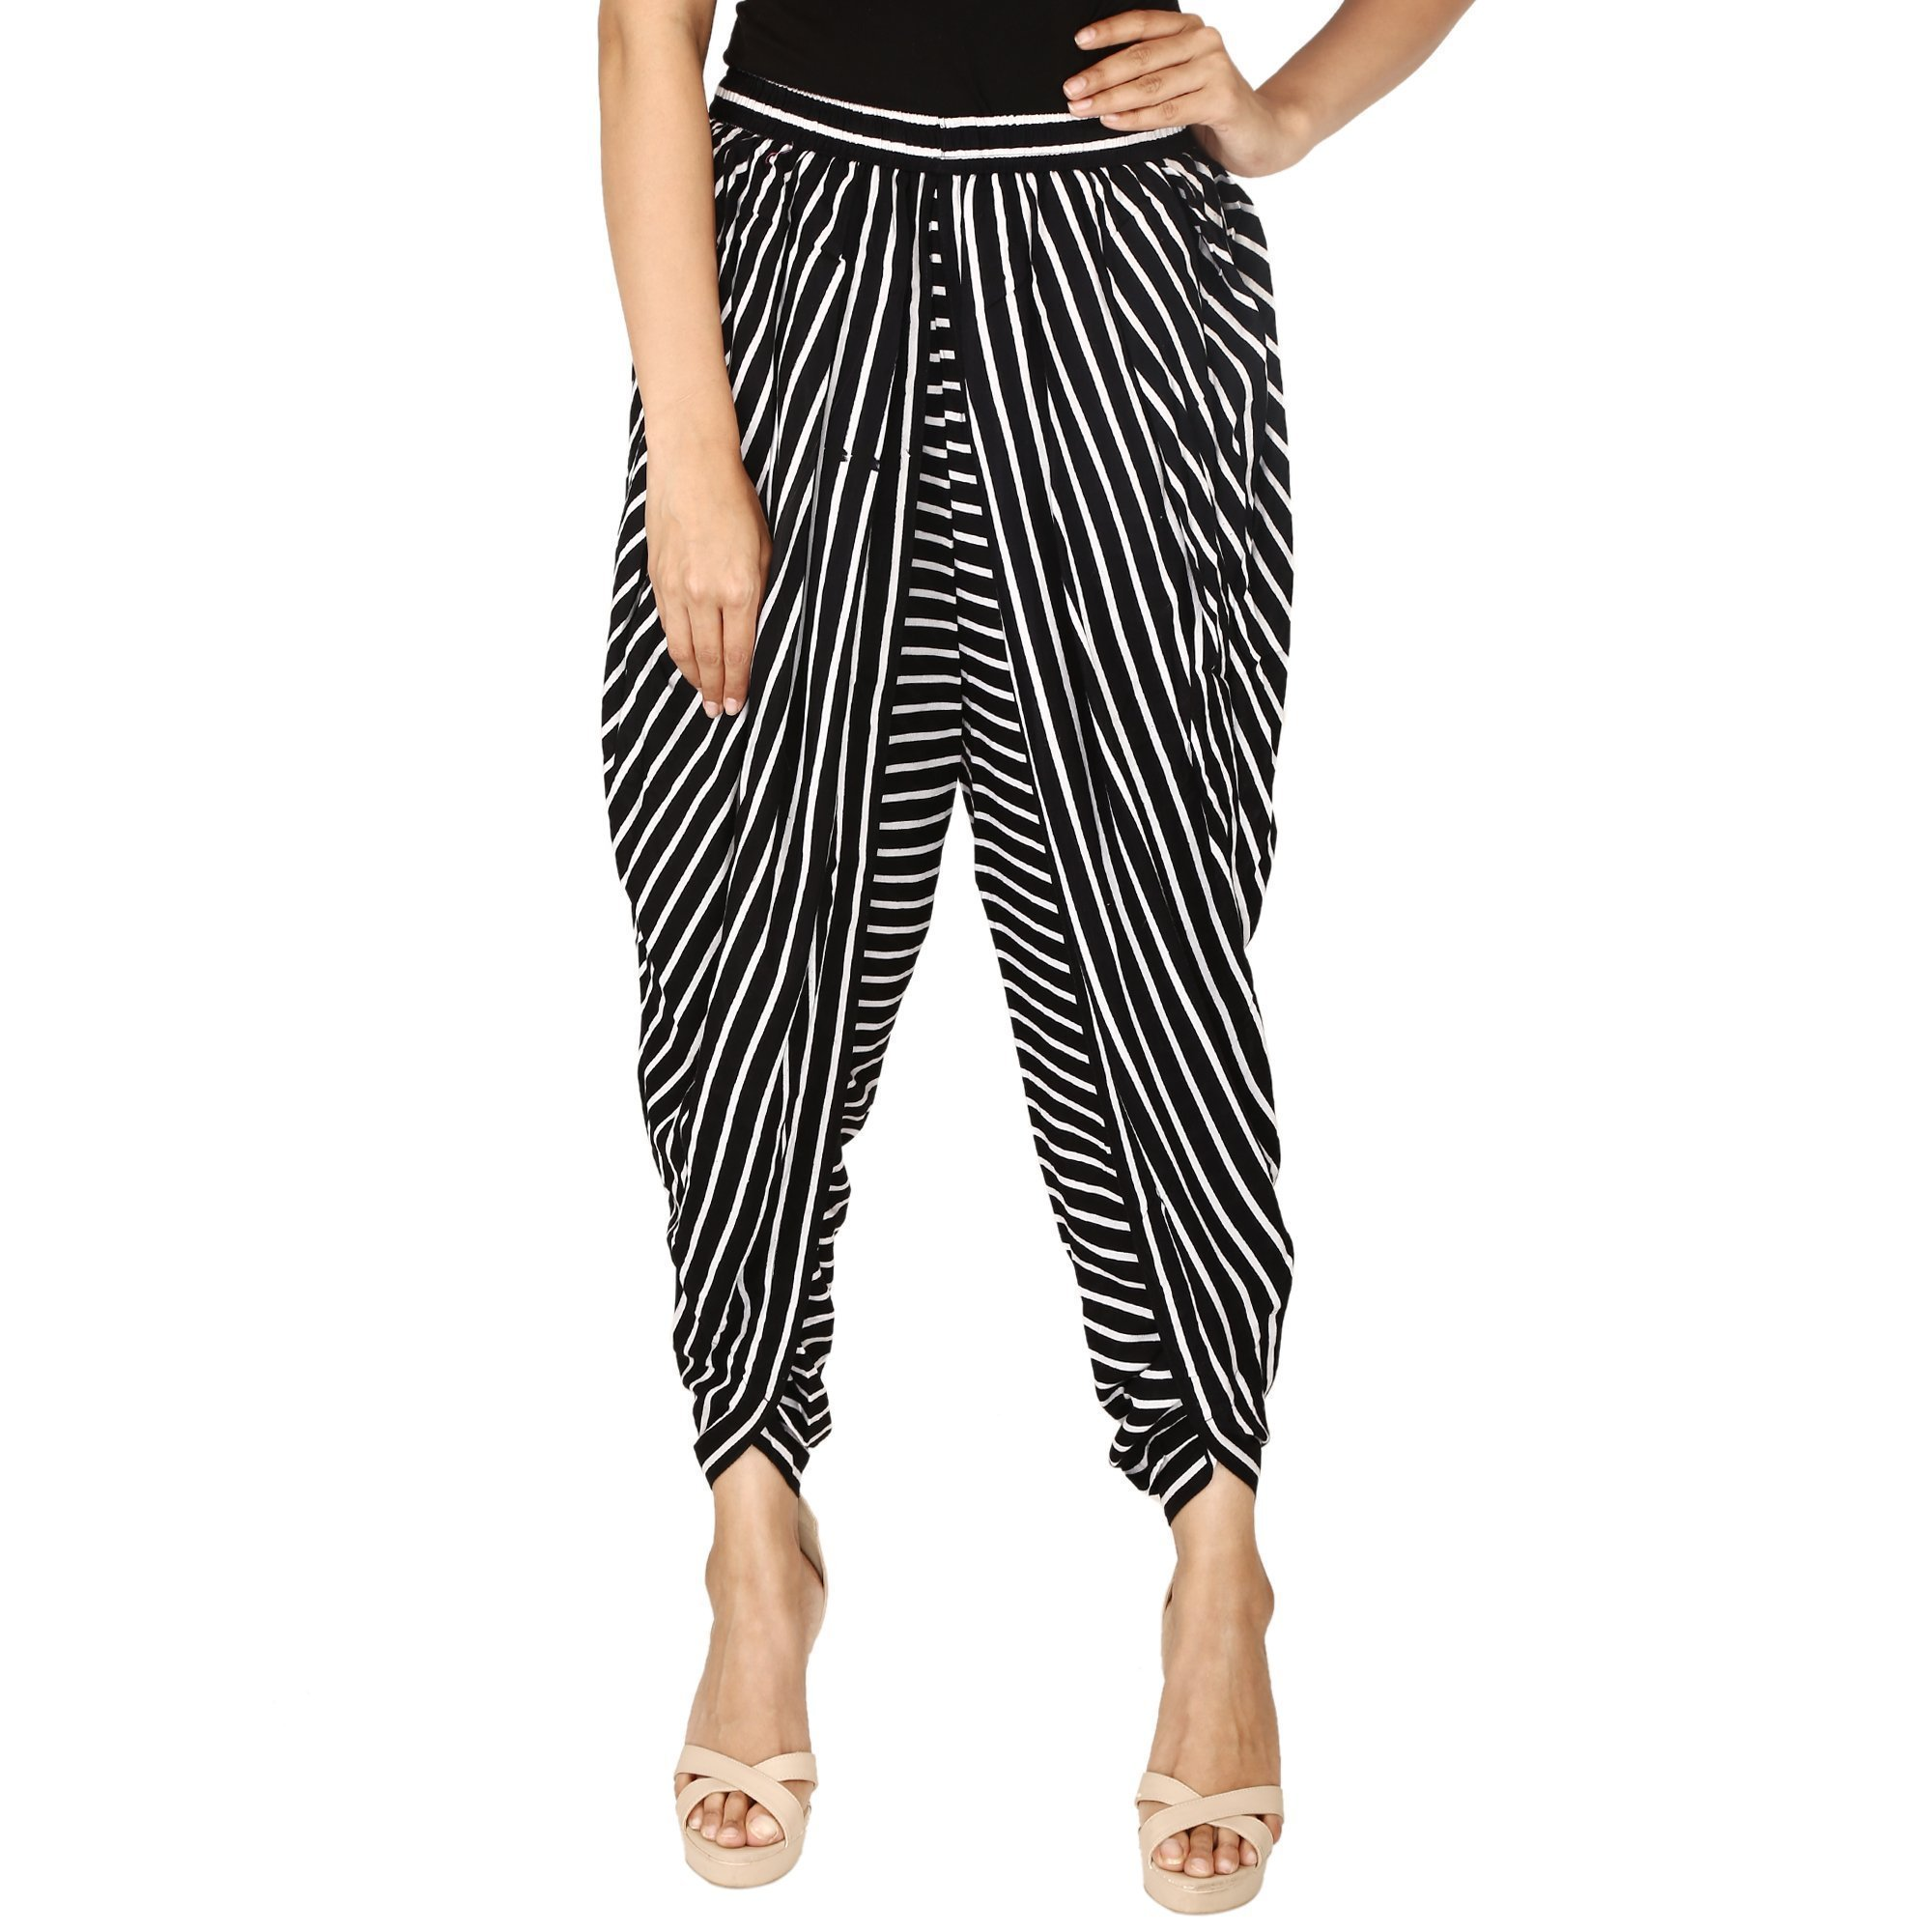 Black and White Striped Rayon Dhoti Pant, Patiala Dhoti Salwar, Dhoti Trousers for Women, Girls